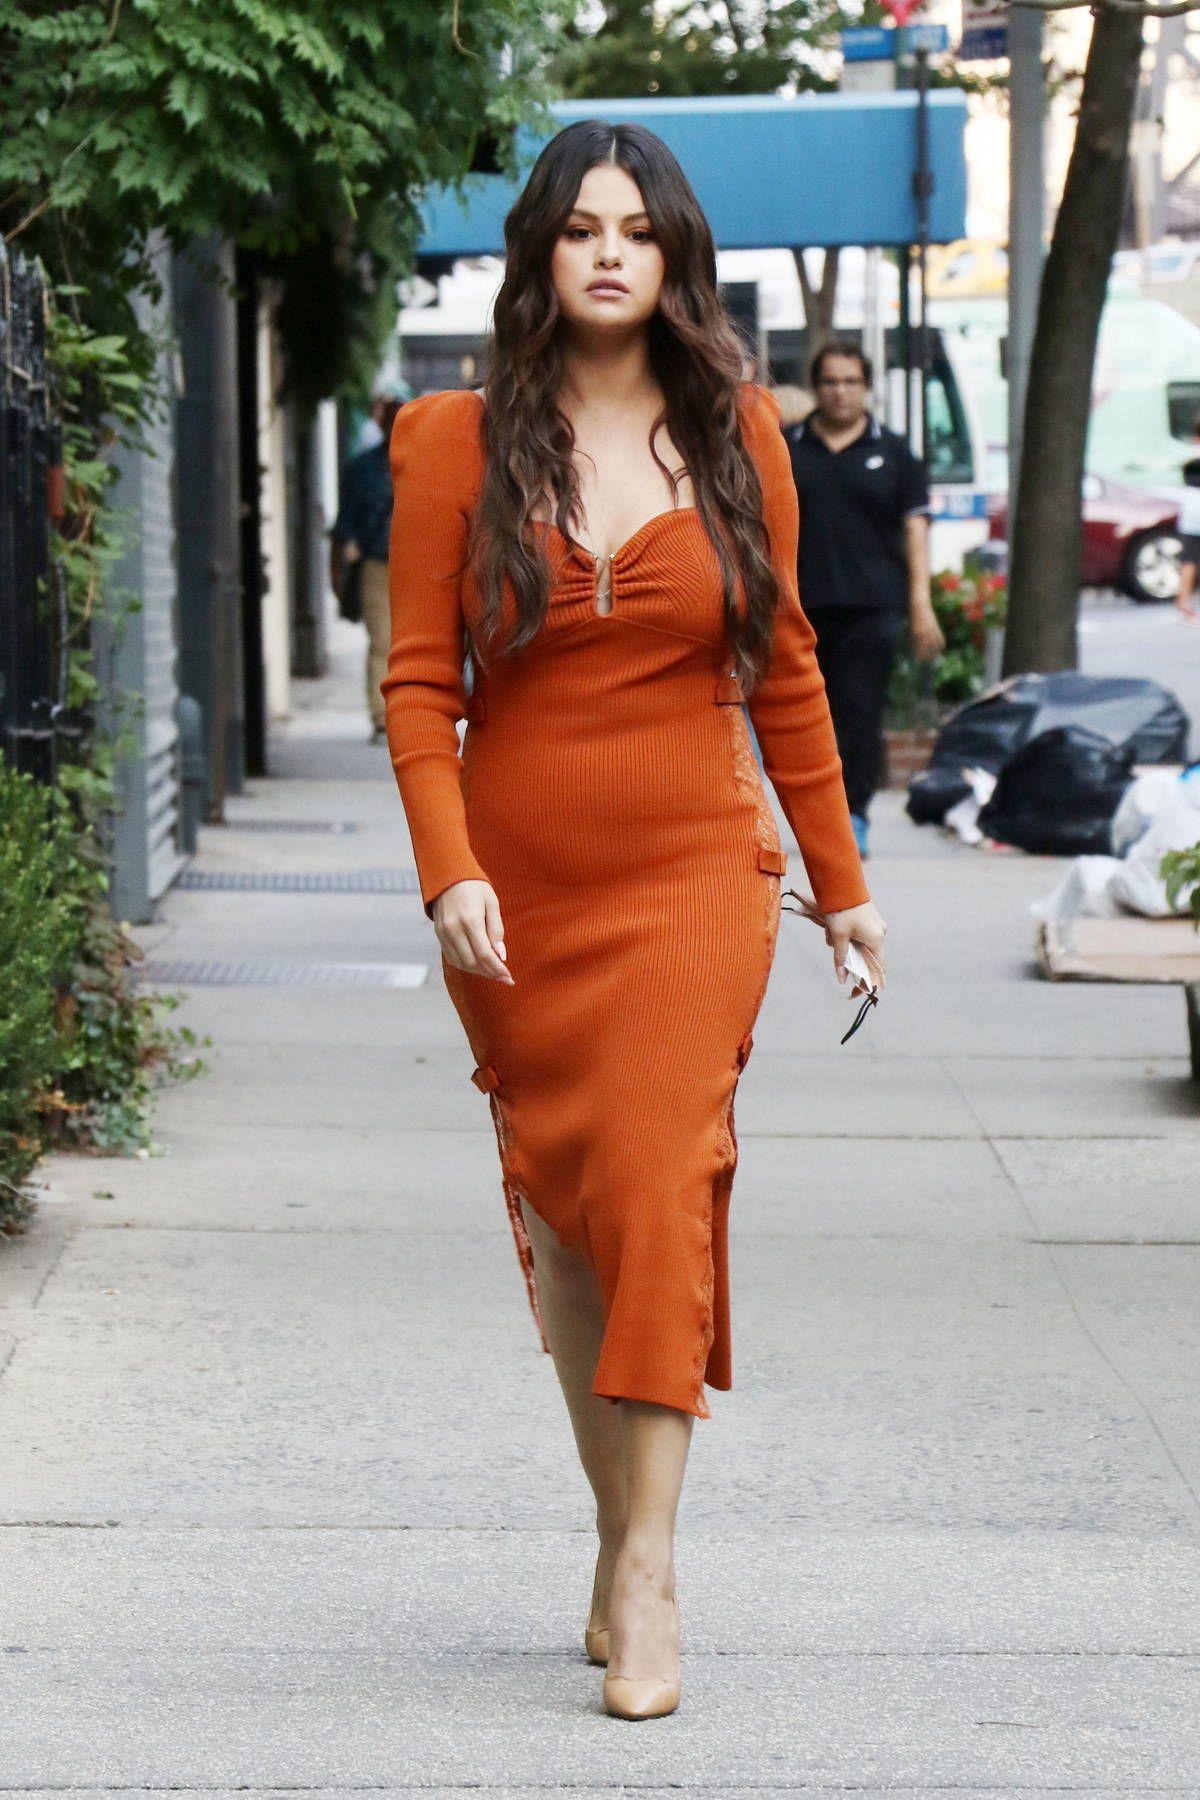 Gaya Terkini Selena Gomez yang Diisukan Dekat dengan Chris Evans